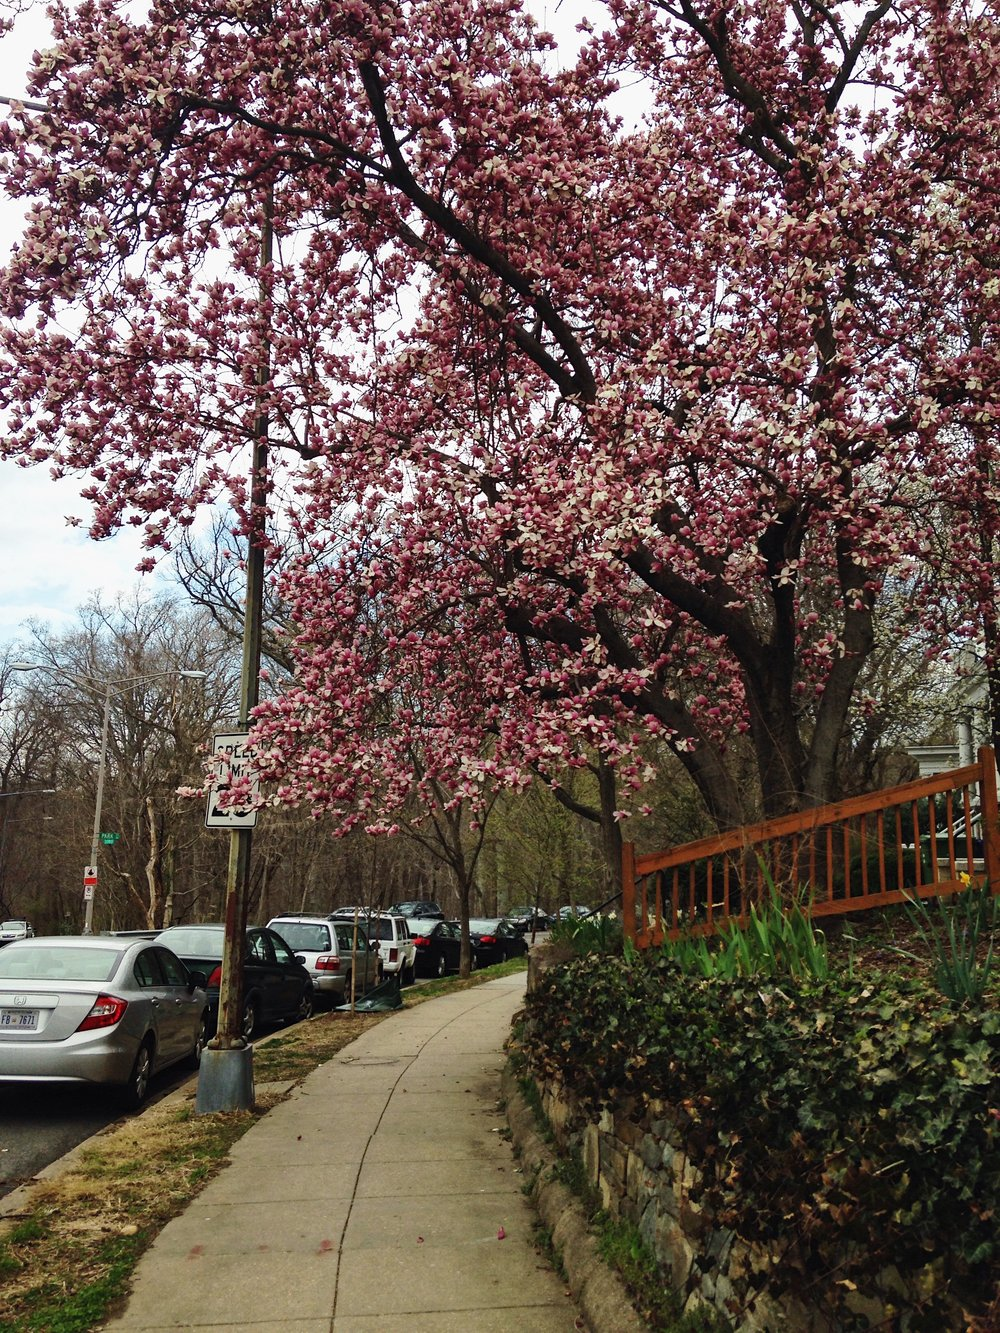 Spring comes to D.C. © E.A. Crunden